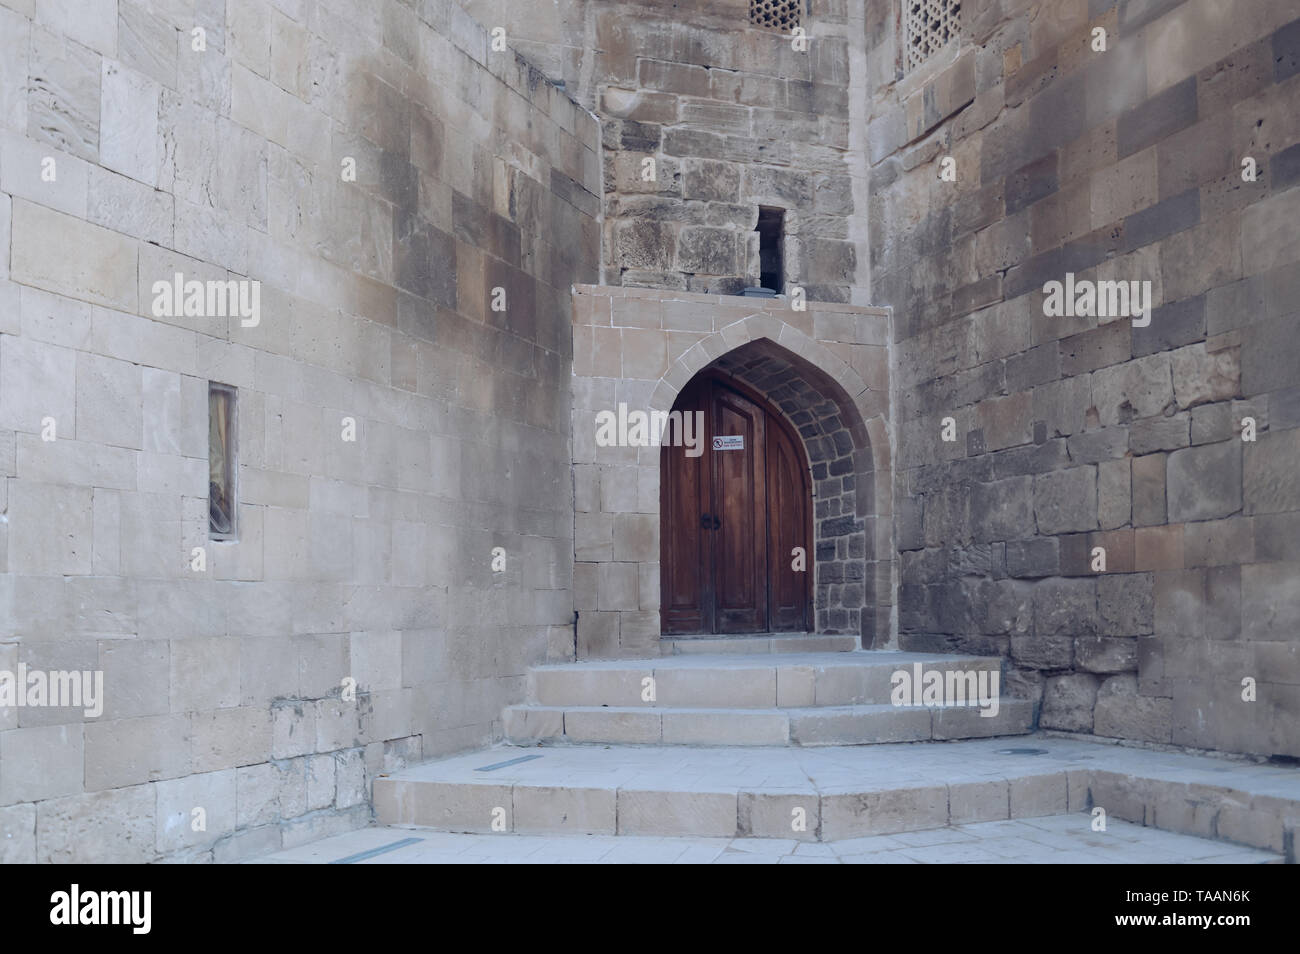 walls and door of shirvanshah palace exterior - Stock Image